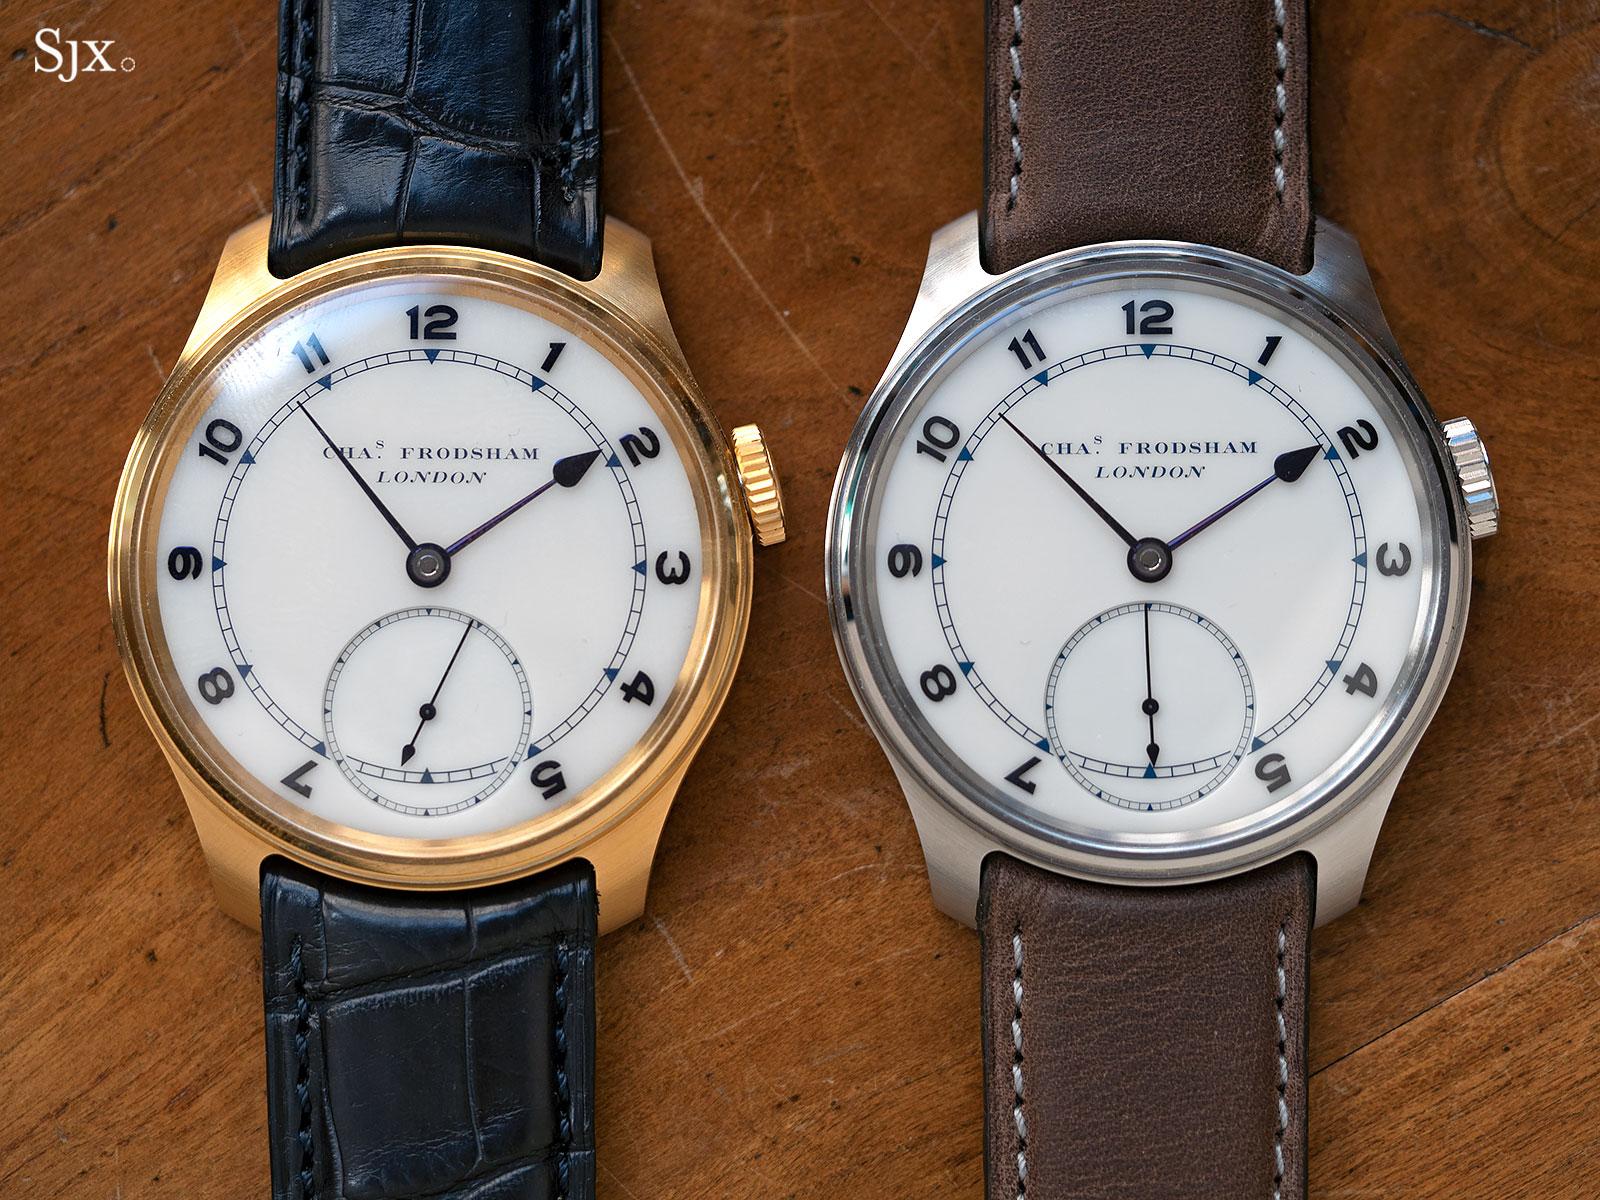 Charles Frodsham Double Impulse chronometer wristwatch 2